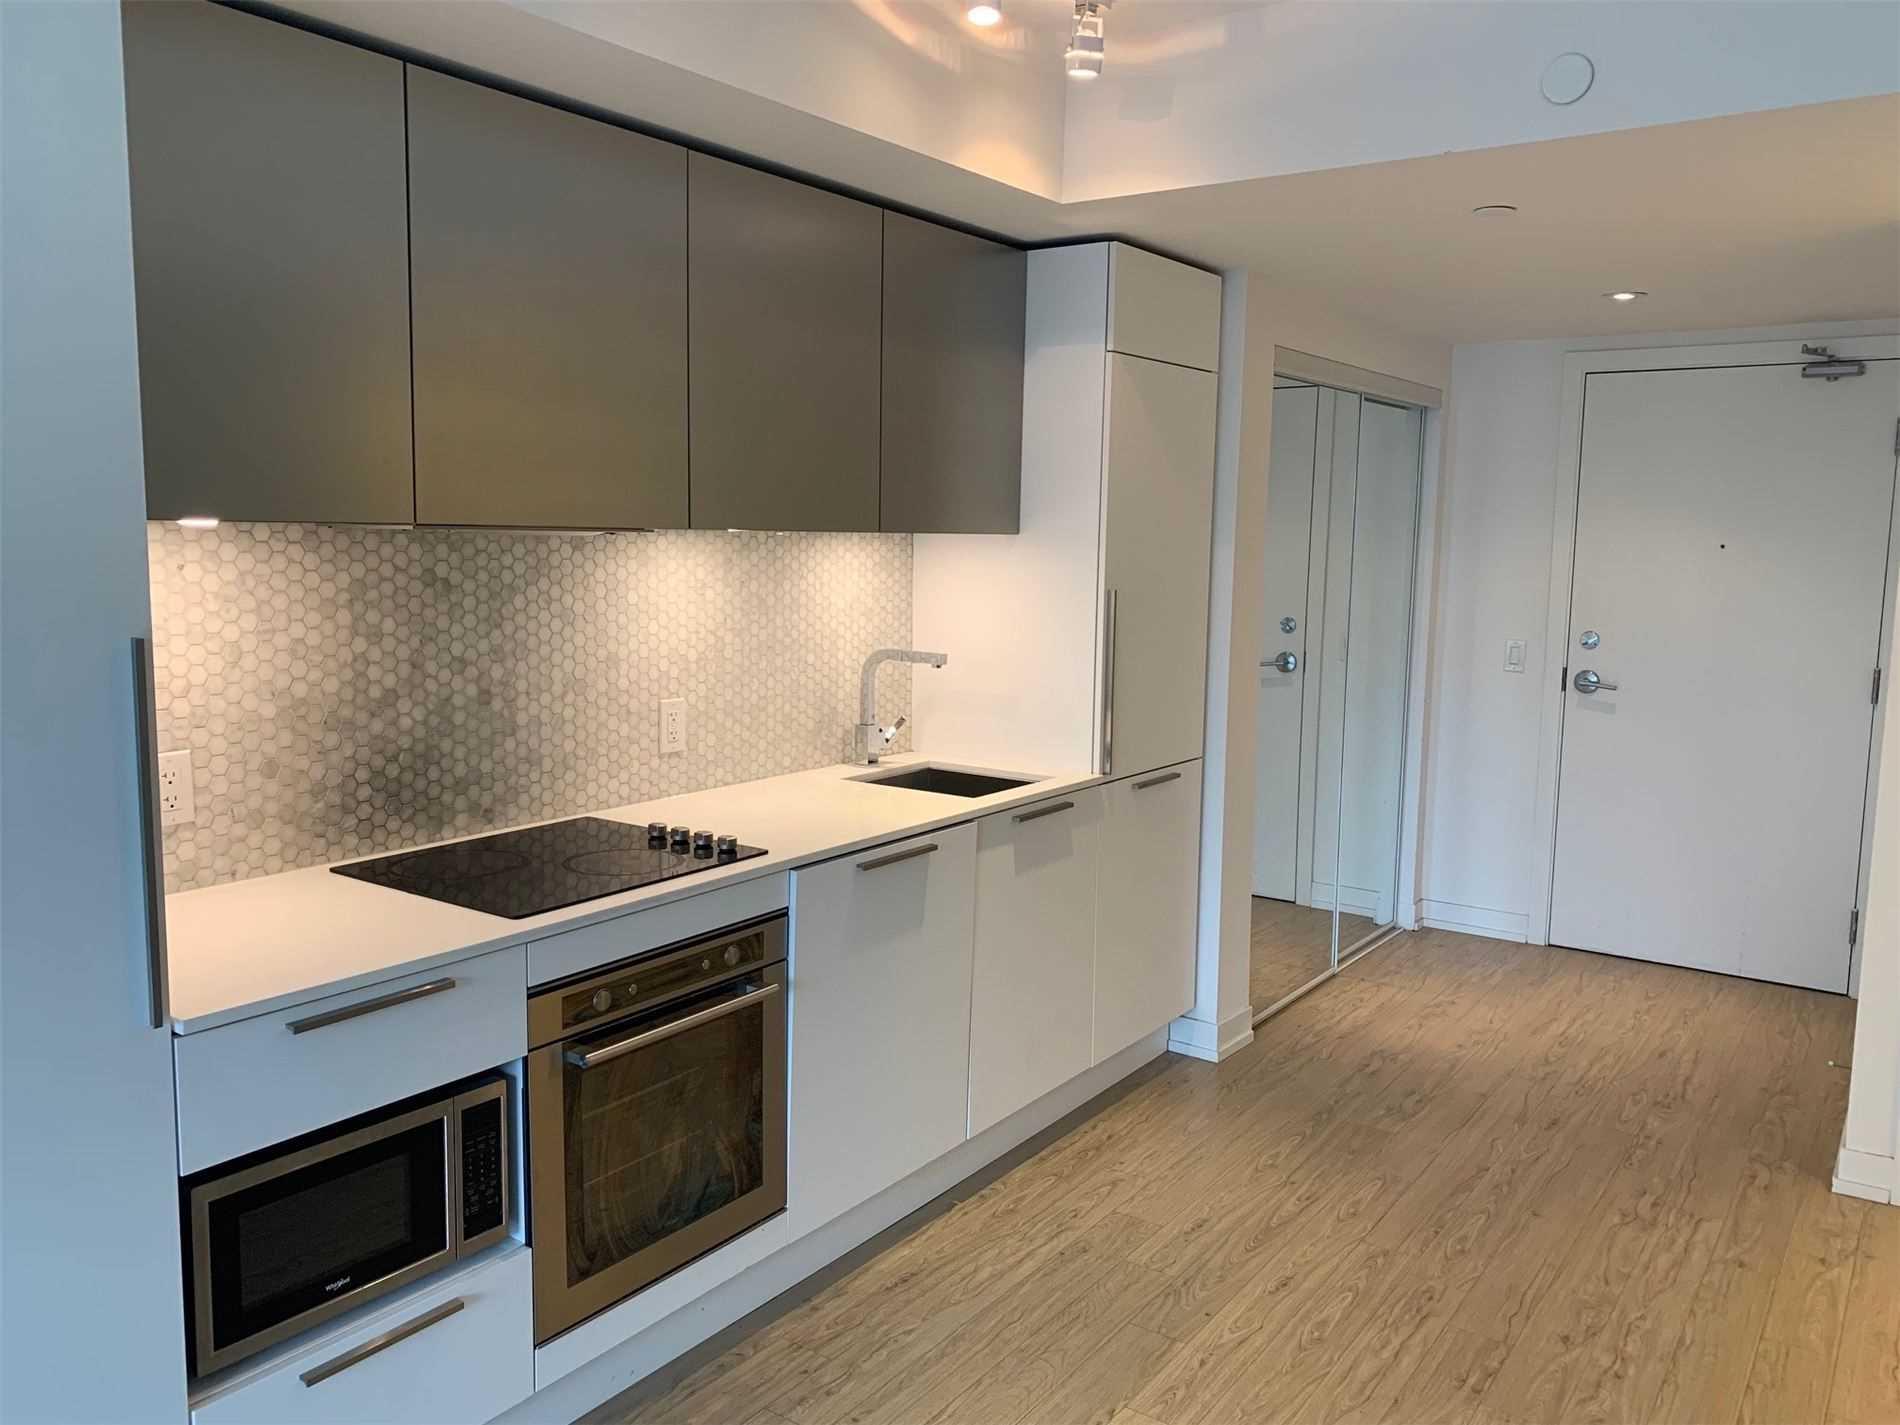 1001 - 85 Wood St - Church-Yonge Corridor Condo Apt for sale, 1 Bedroom (C5221011) - #7